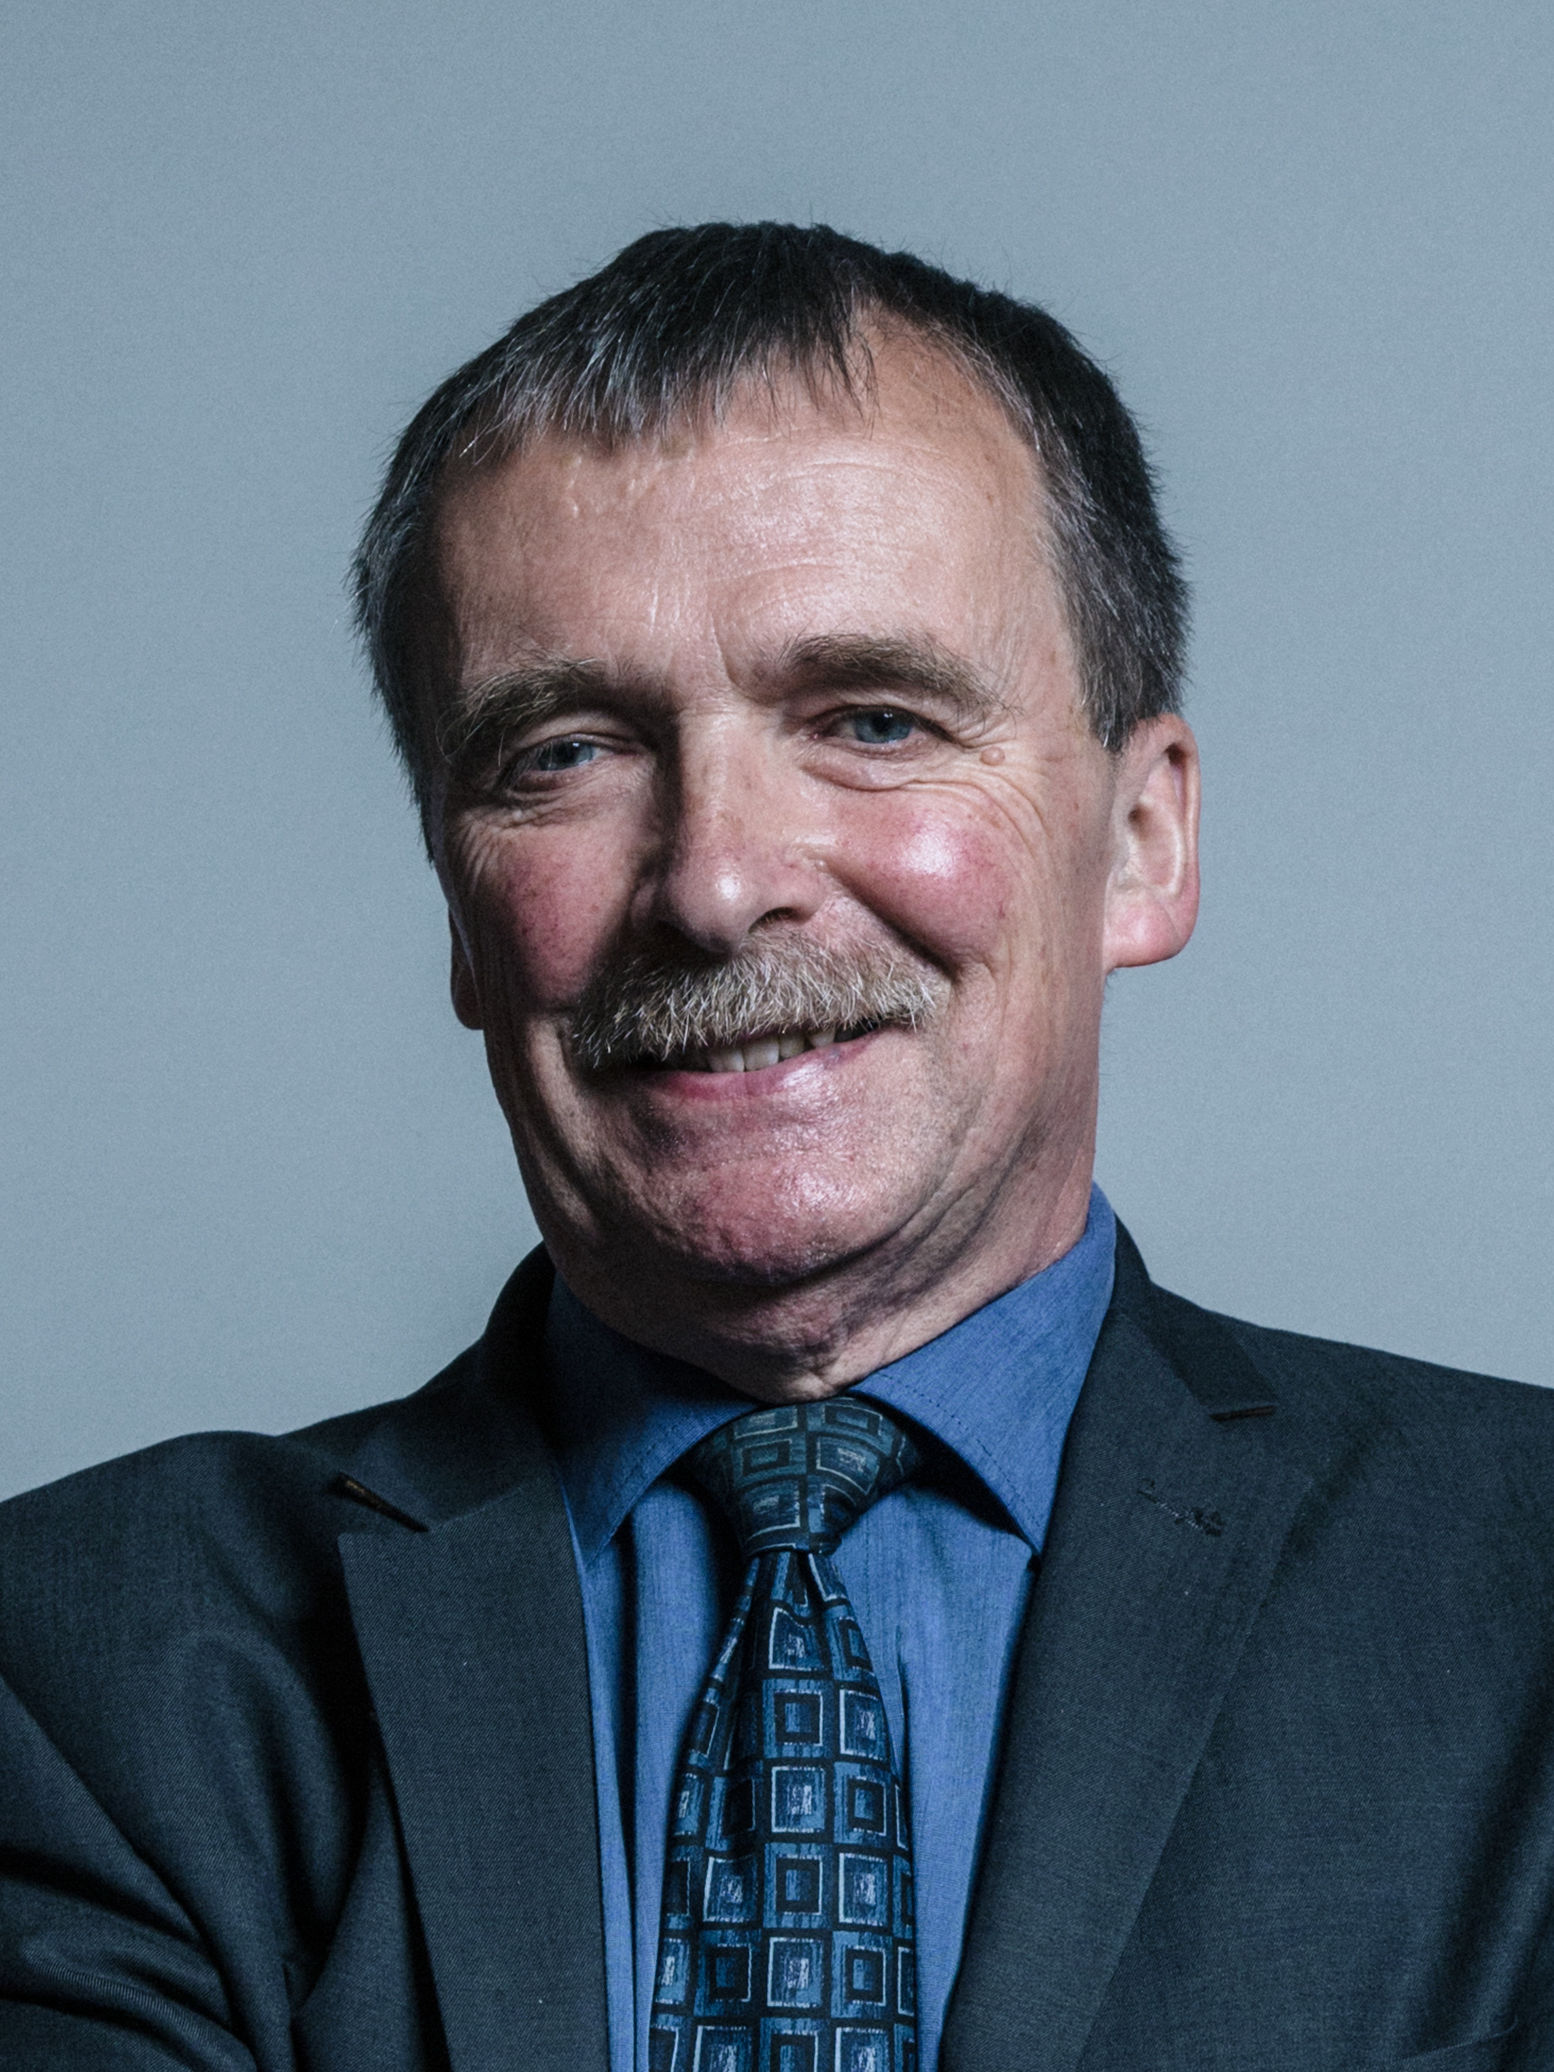 Dr Alan Whitehead MP